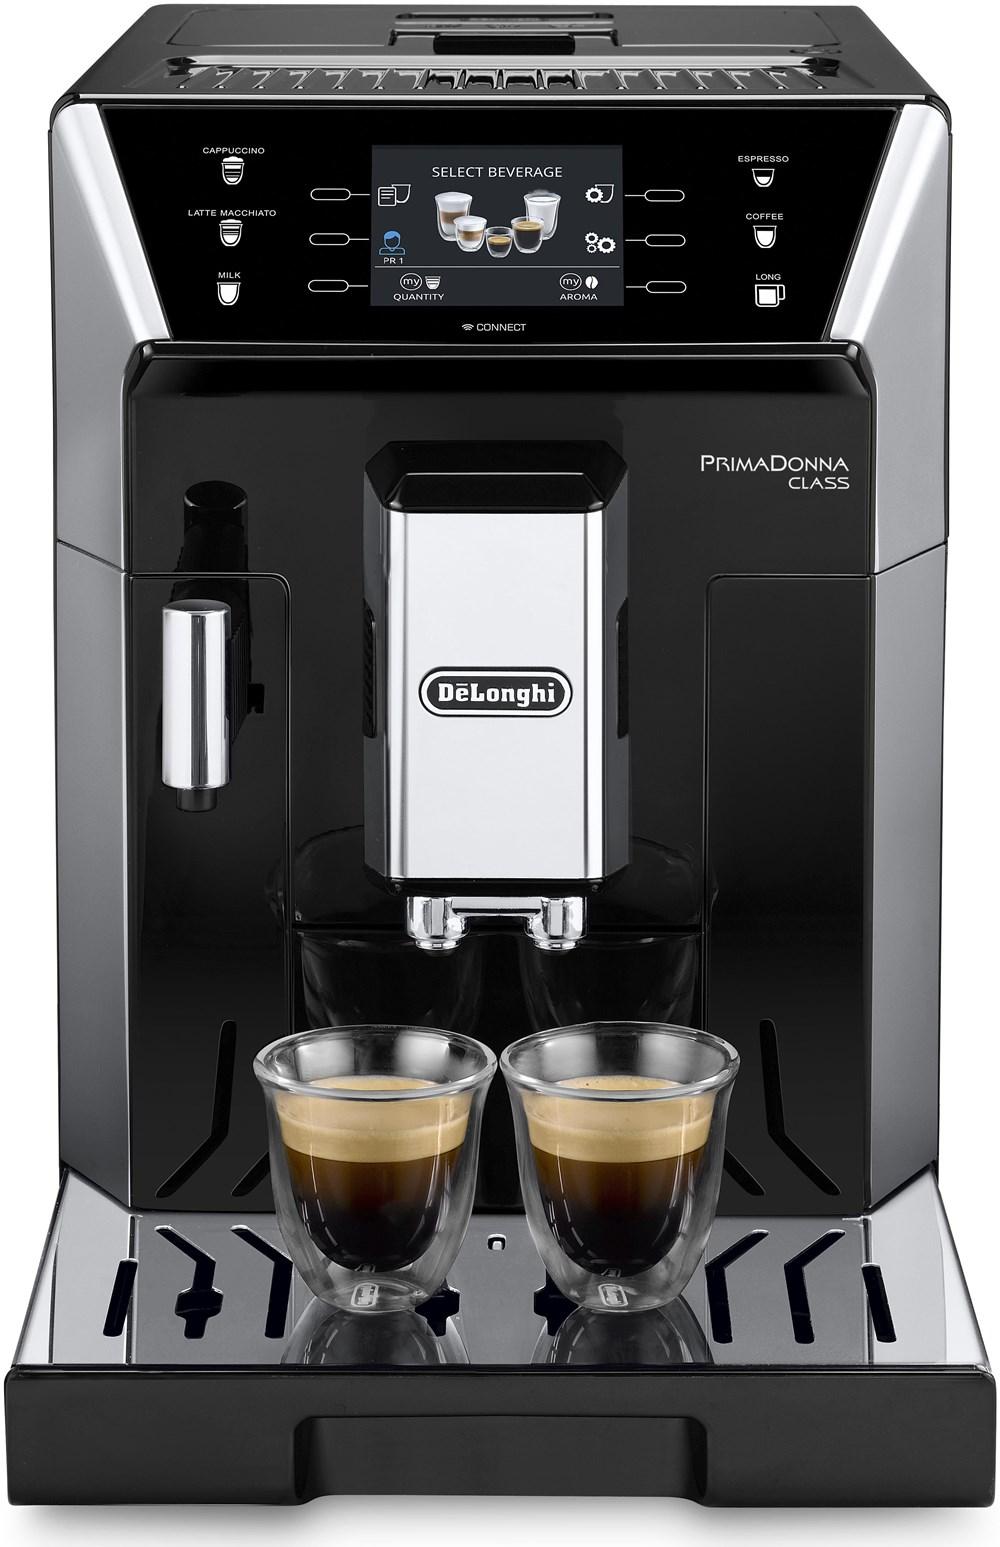 delonghi primadonna ecam class schwarz silber kaffeevollautomaten computeruniverse. Black Bedroom Furniture Sets. Home Design Ideas